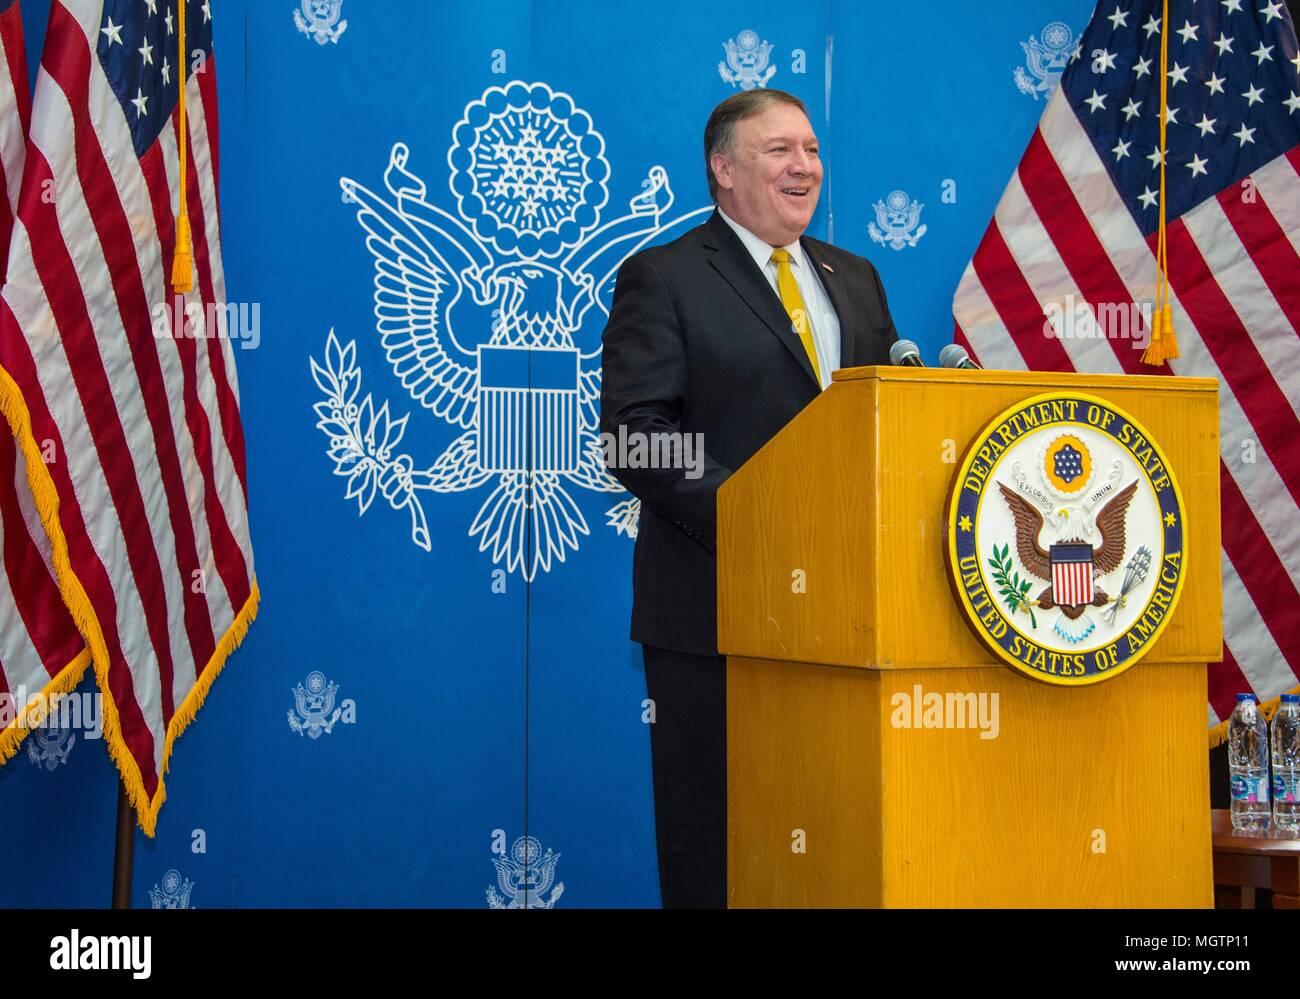 Riyadh, Saudi Arabia. 28 April 2018. U.S. Secretary of State Mike Pompeo delivers remarks to staff and families from U.S. Embassy Riyadh April 29, 2018 in Riyadh, Saudi Arabia. Credit: Planetpix/Alamy Live News - Stock Image